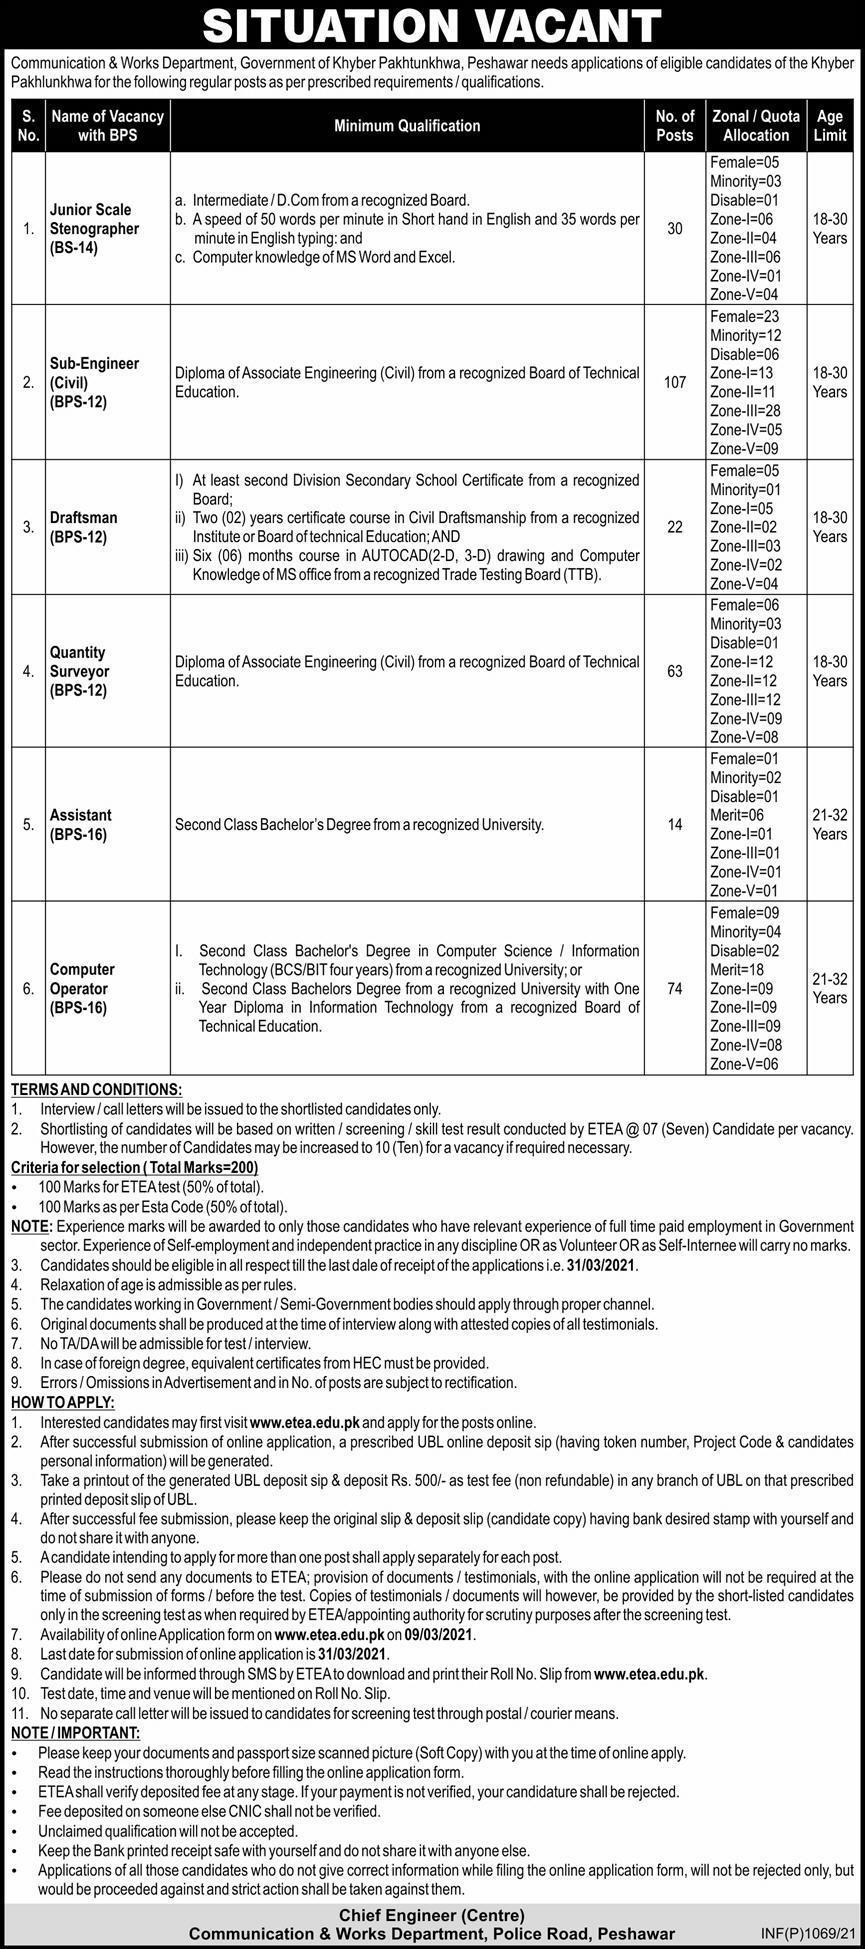 Communication & Works Department KP Jobs